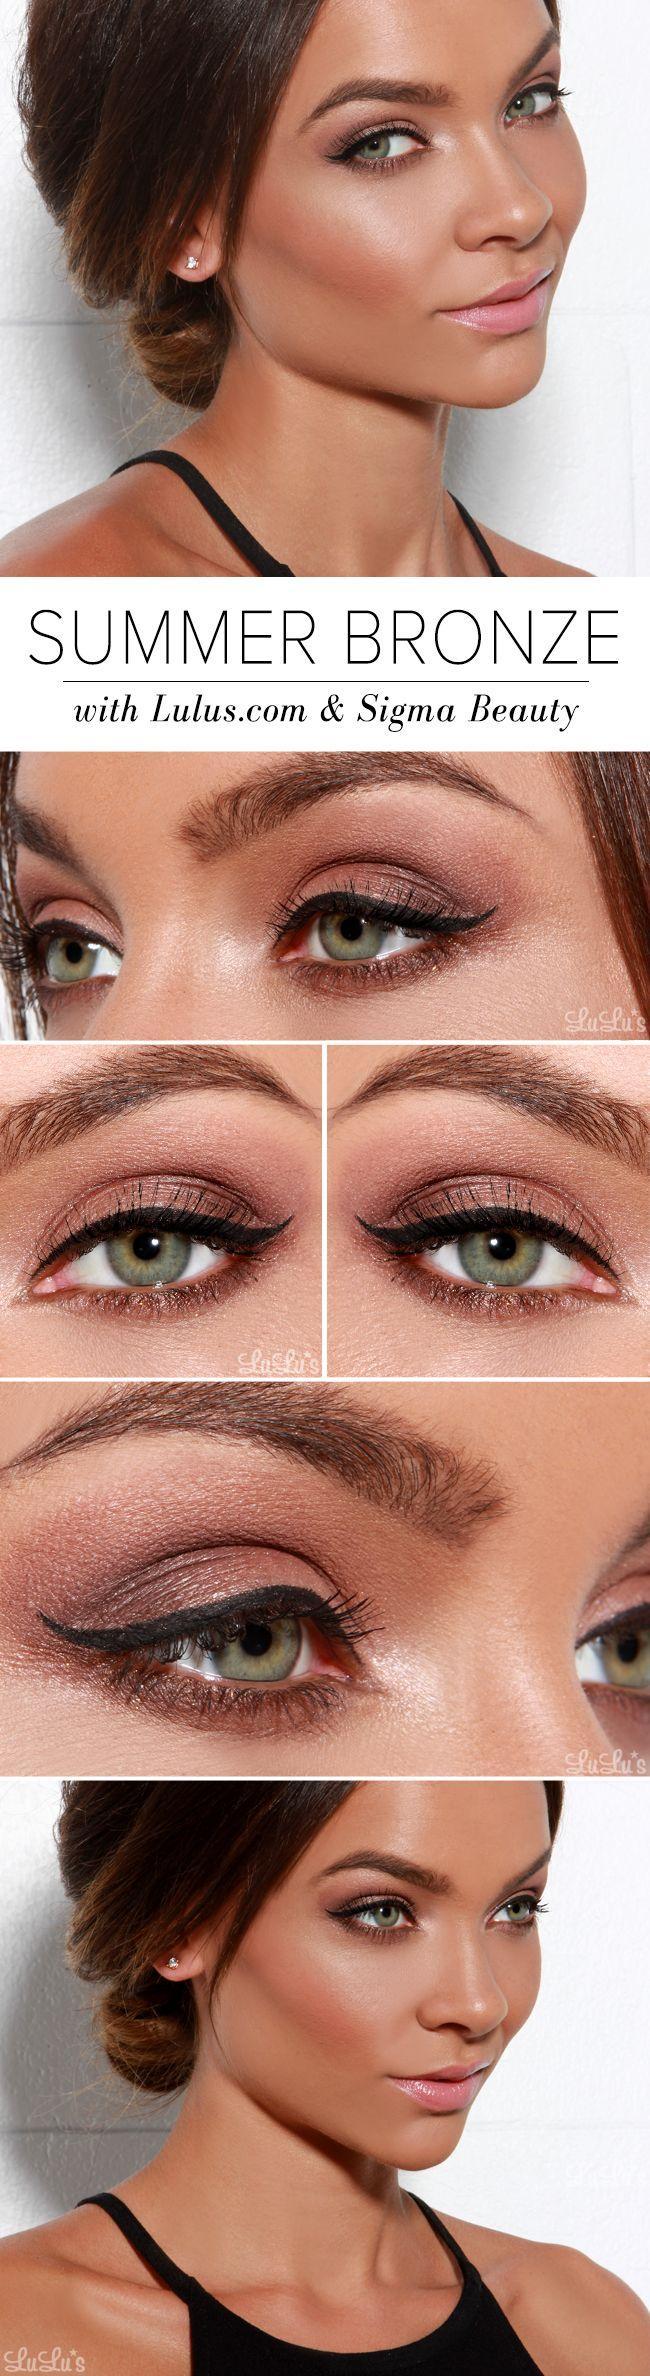 Свадьба - Get The Look: Summer Bronze Makeup With Sigma Beauty!